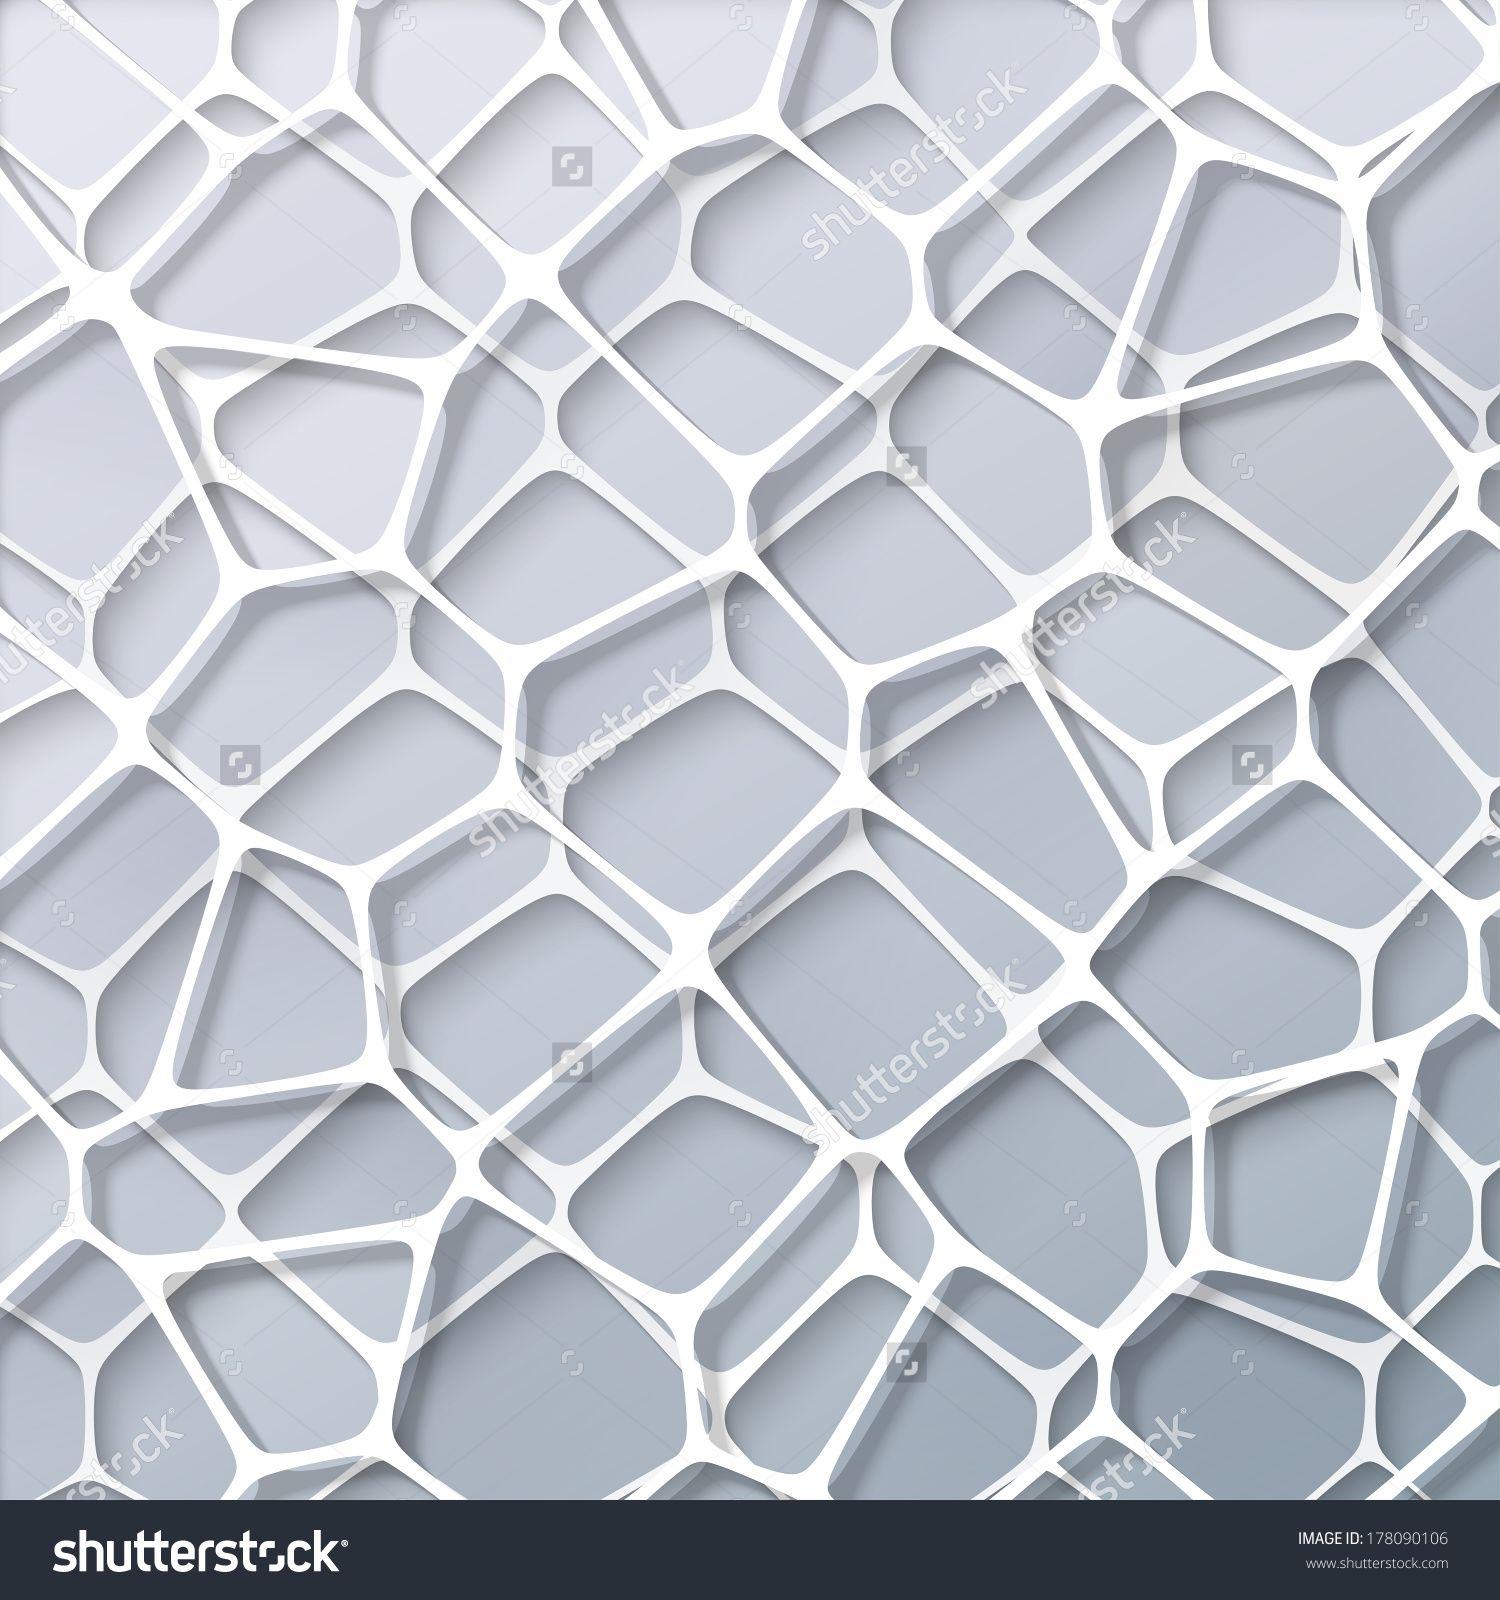 Background image src - Http Www Shutterstock Com Fr Pic 178090106